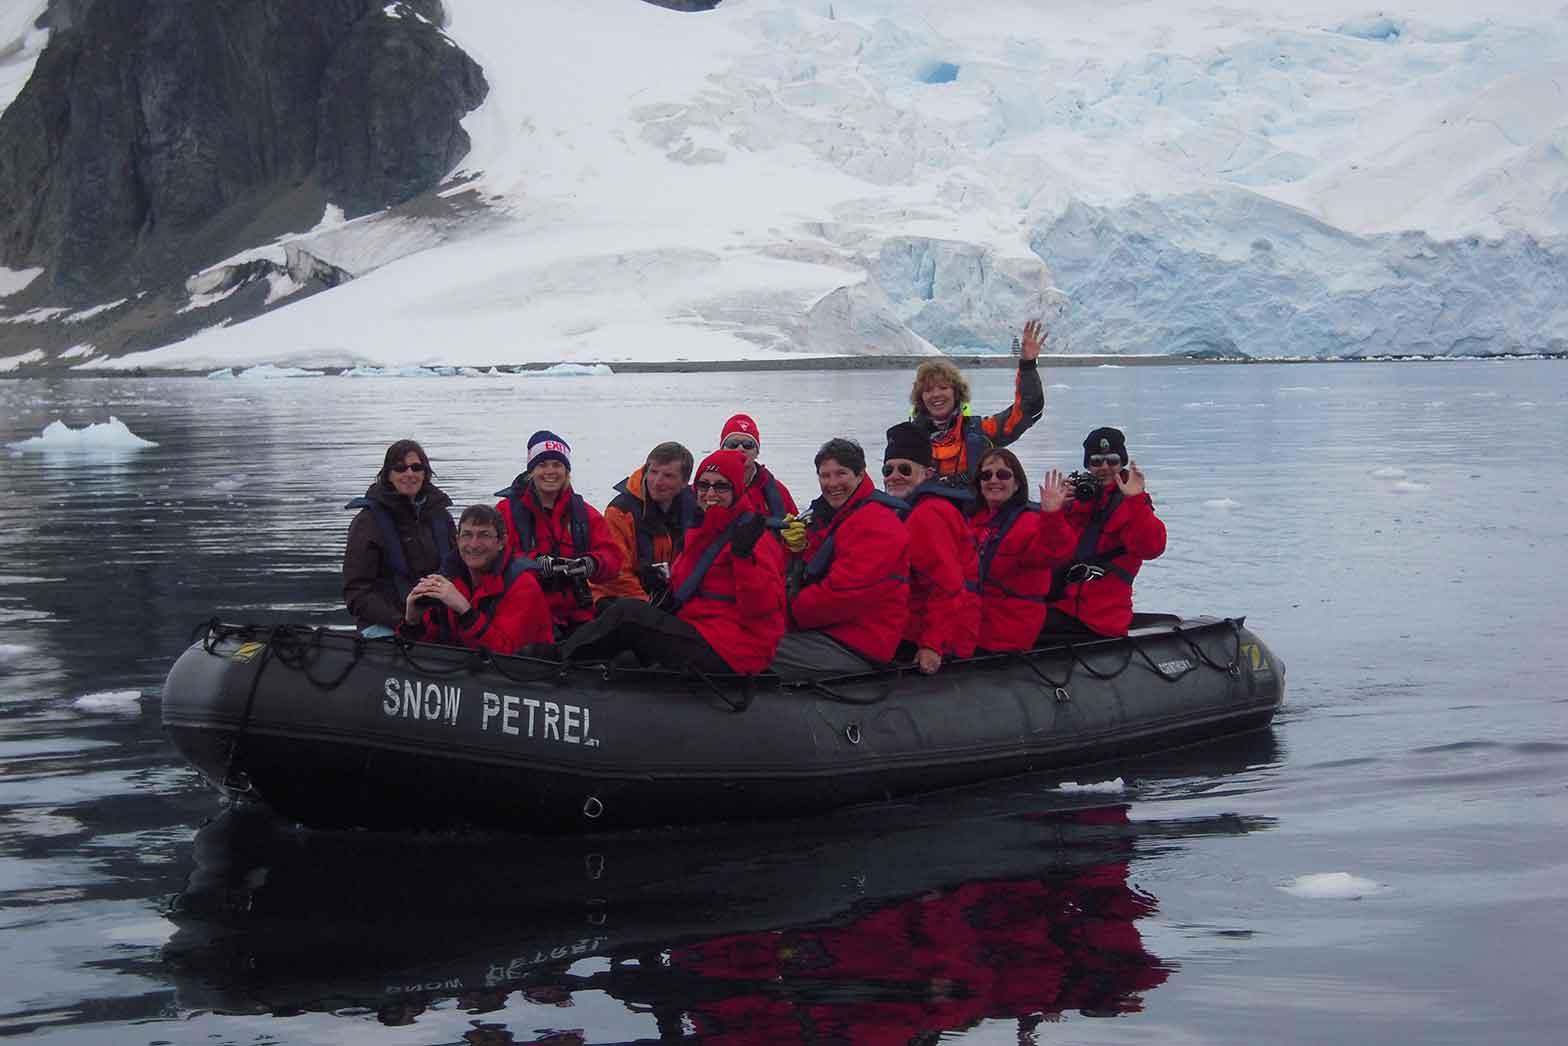 Aboard Snow Petral